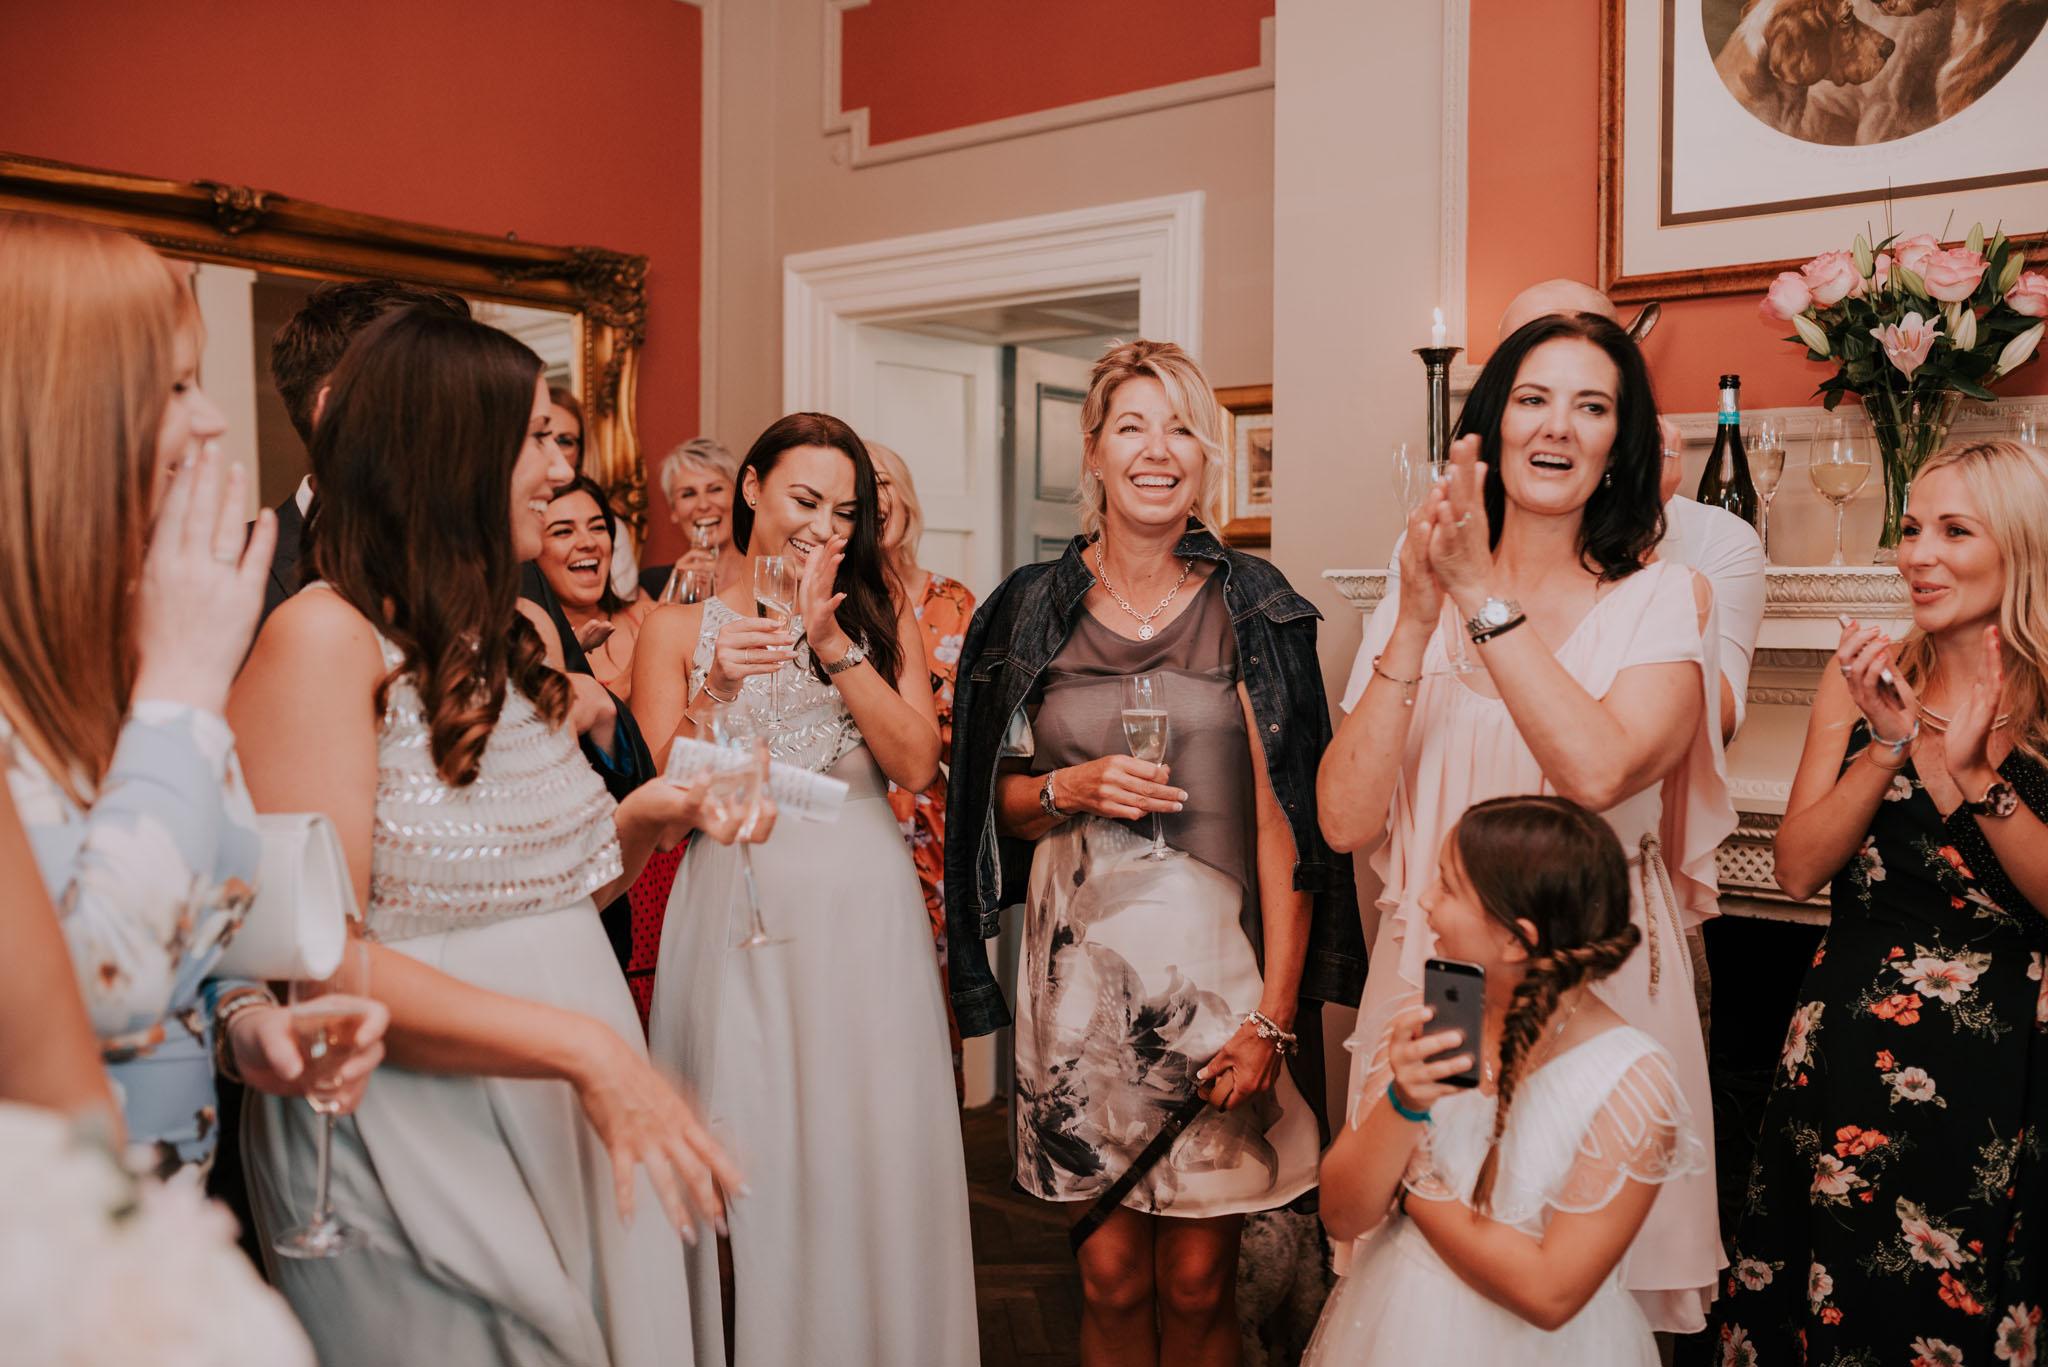 wedding-photographer-glewstone-court-hereford-scott-stockwell-photography411.jpg